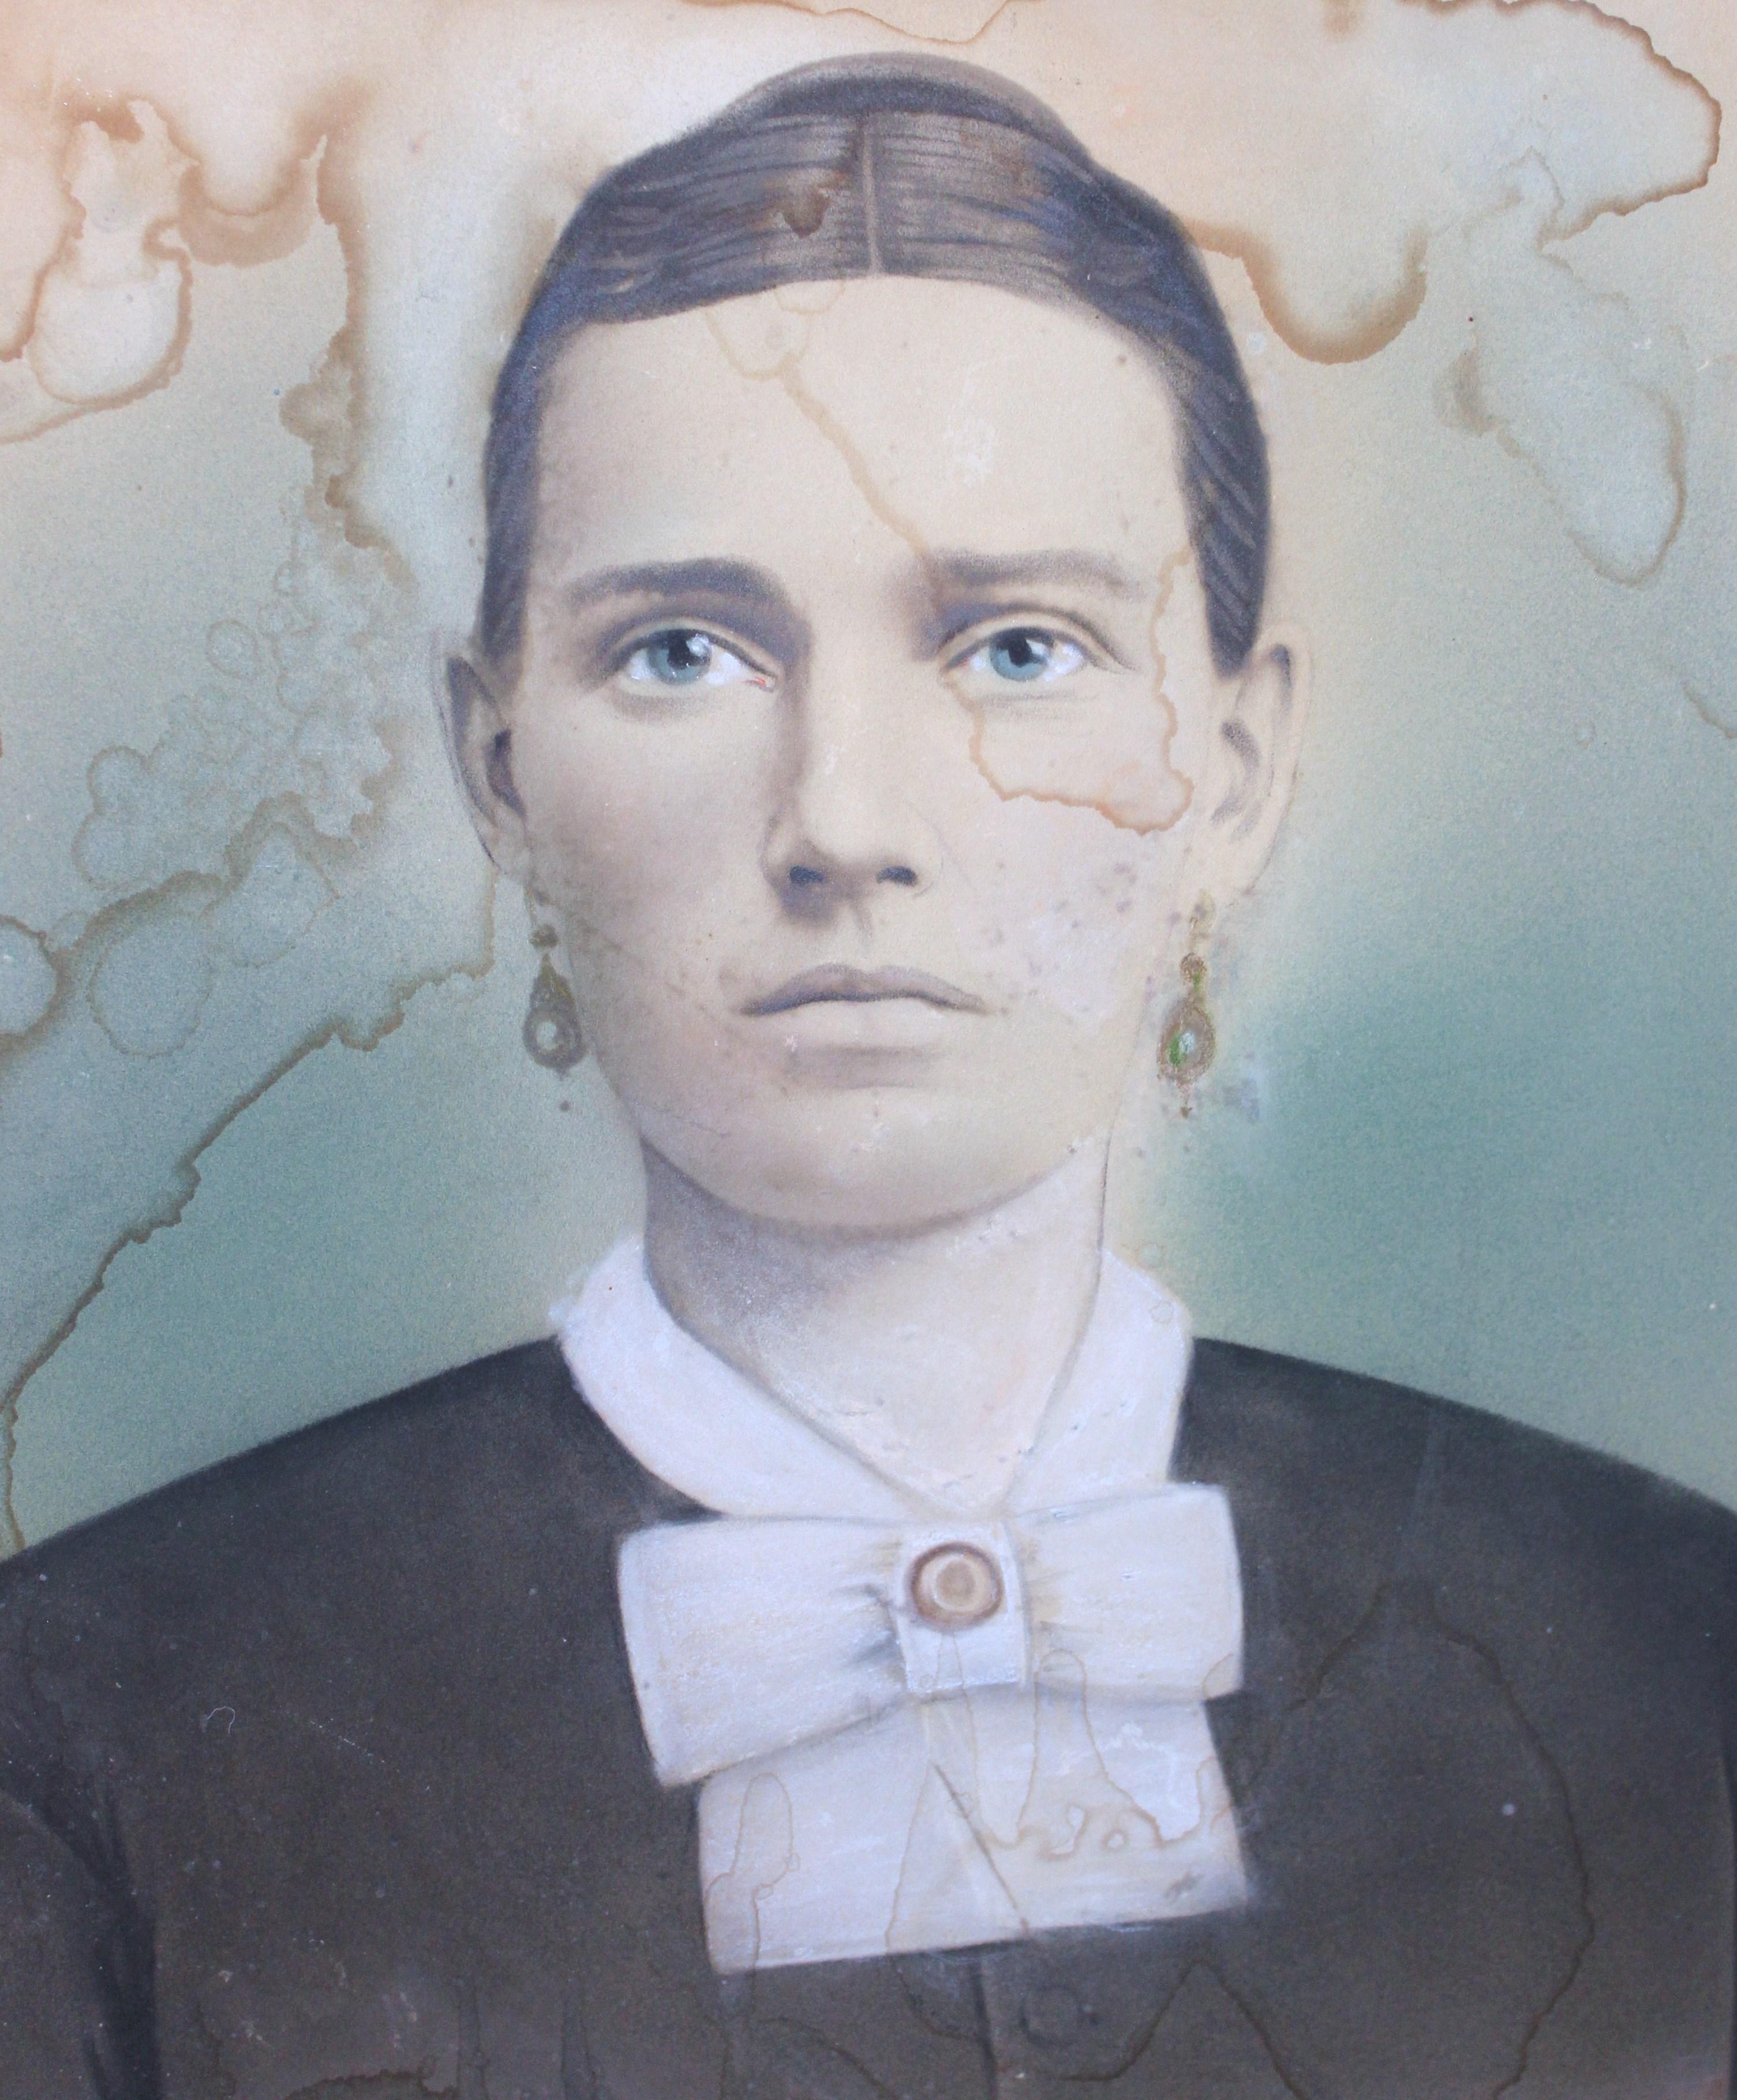 Polly Helton